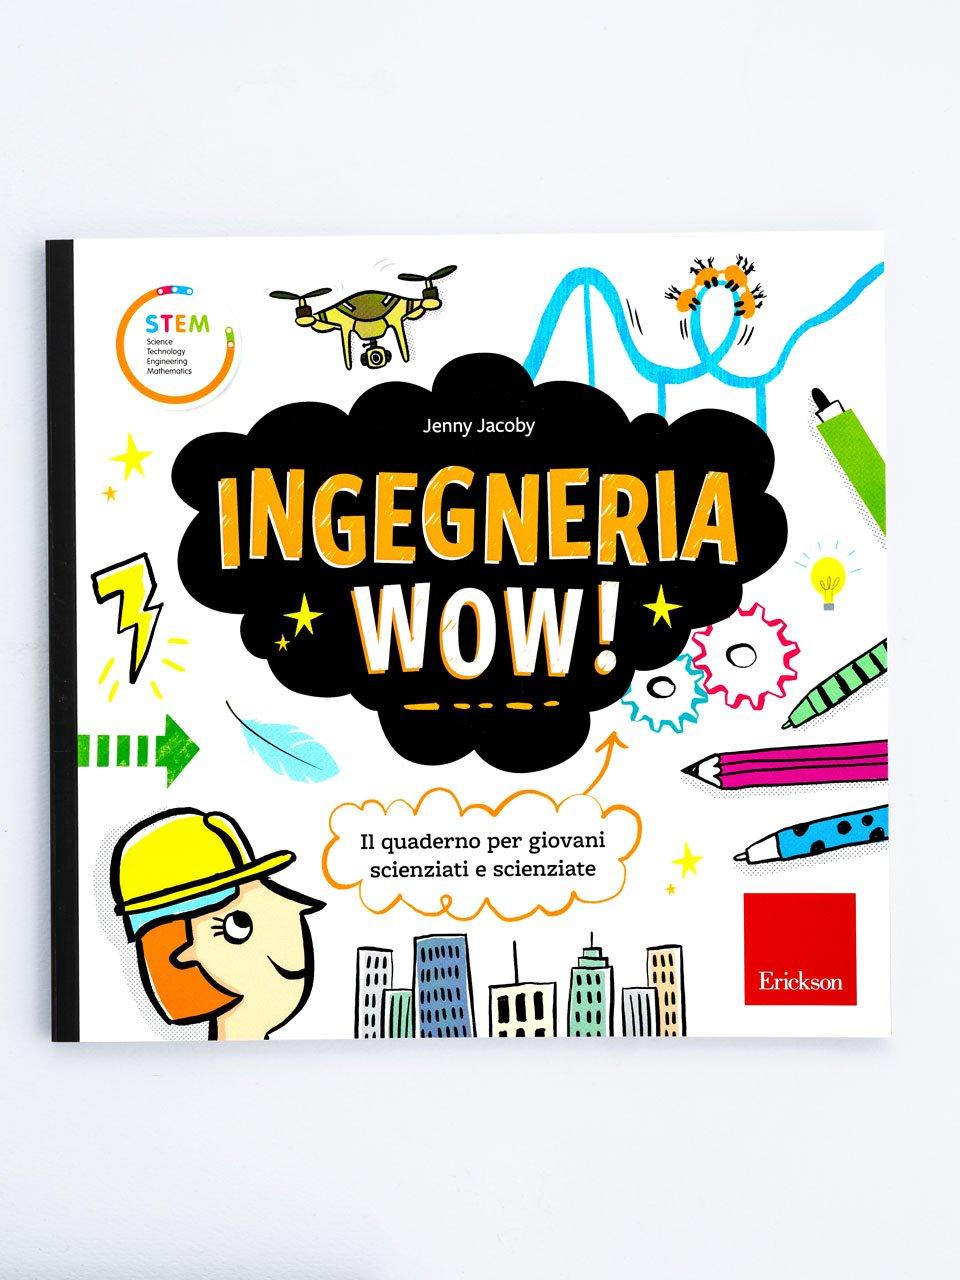 Ingegneria Wow! - Il mago dei numeri - App e software - Erickson